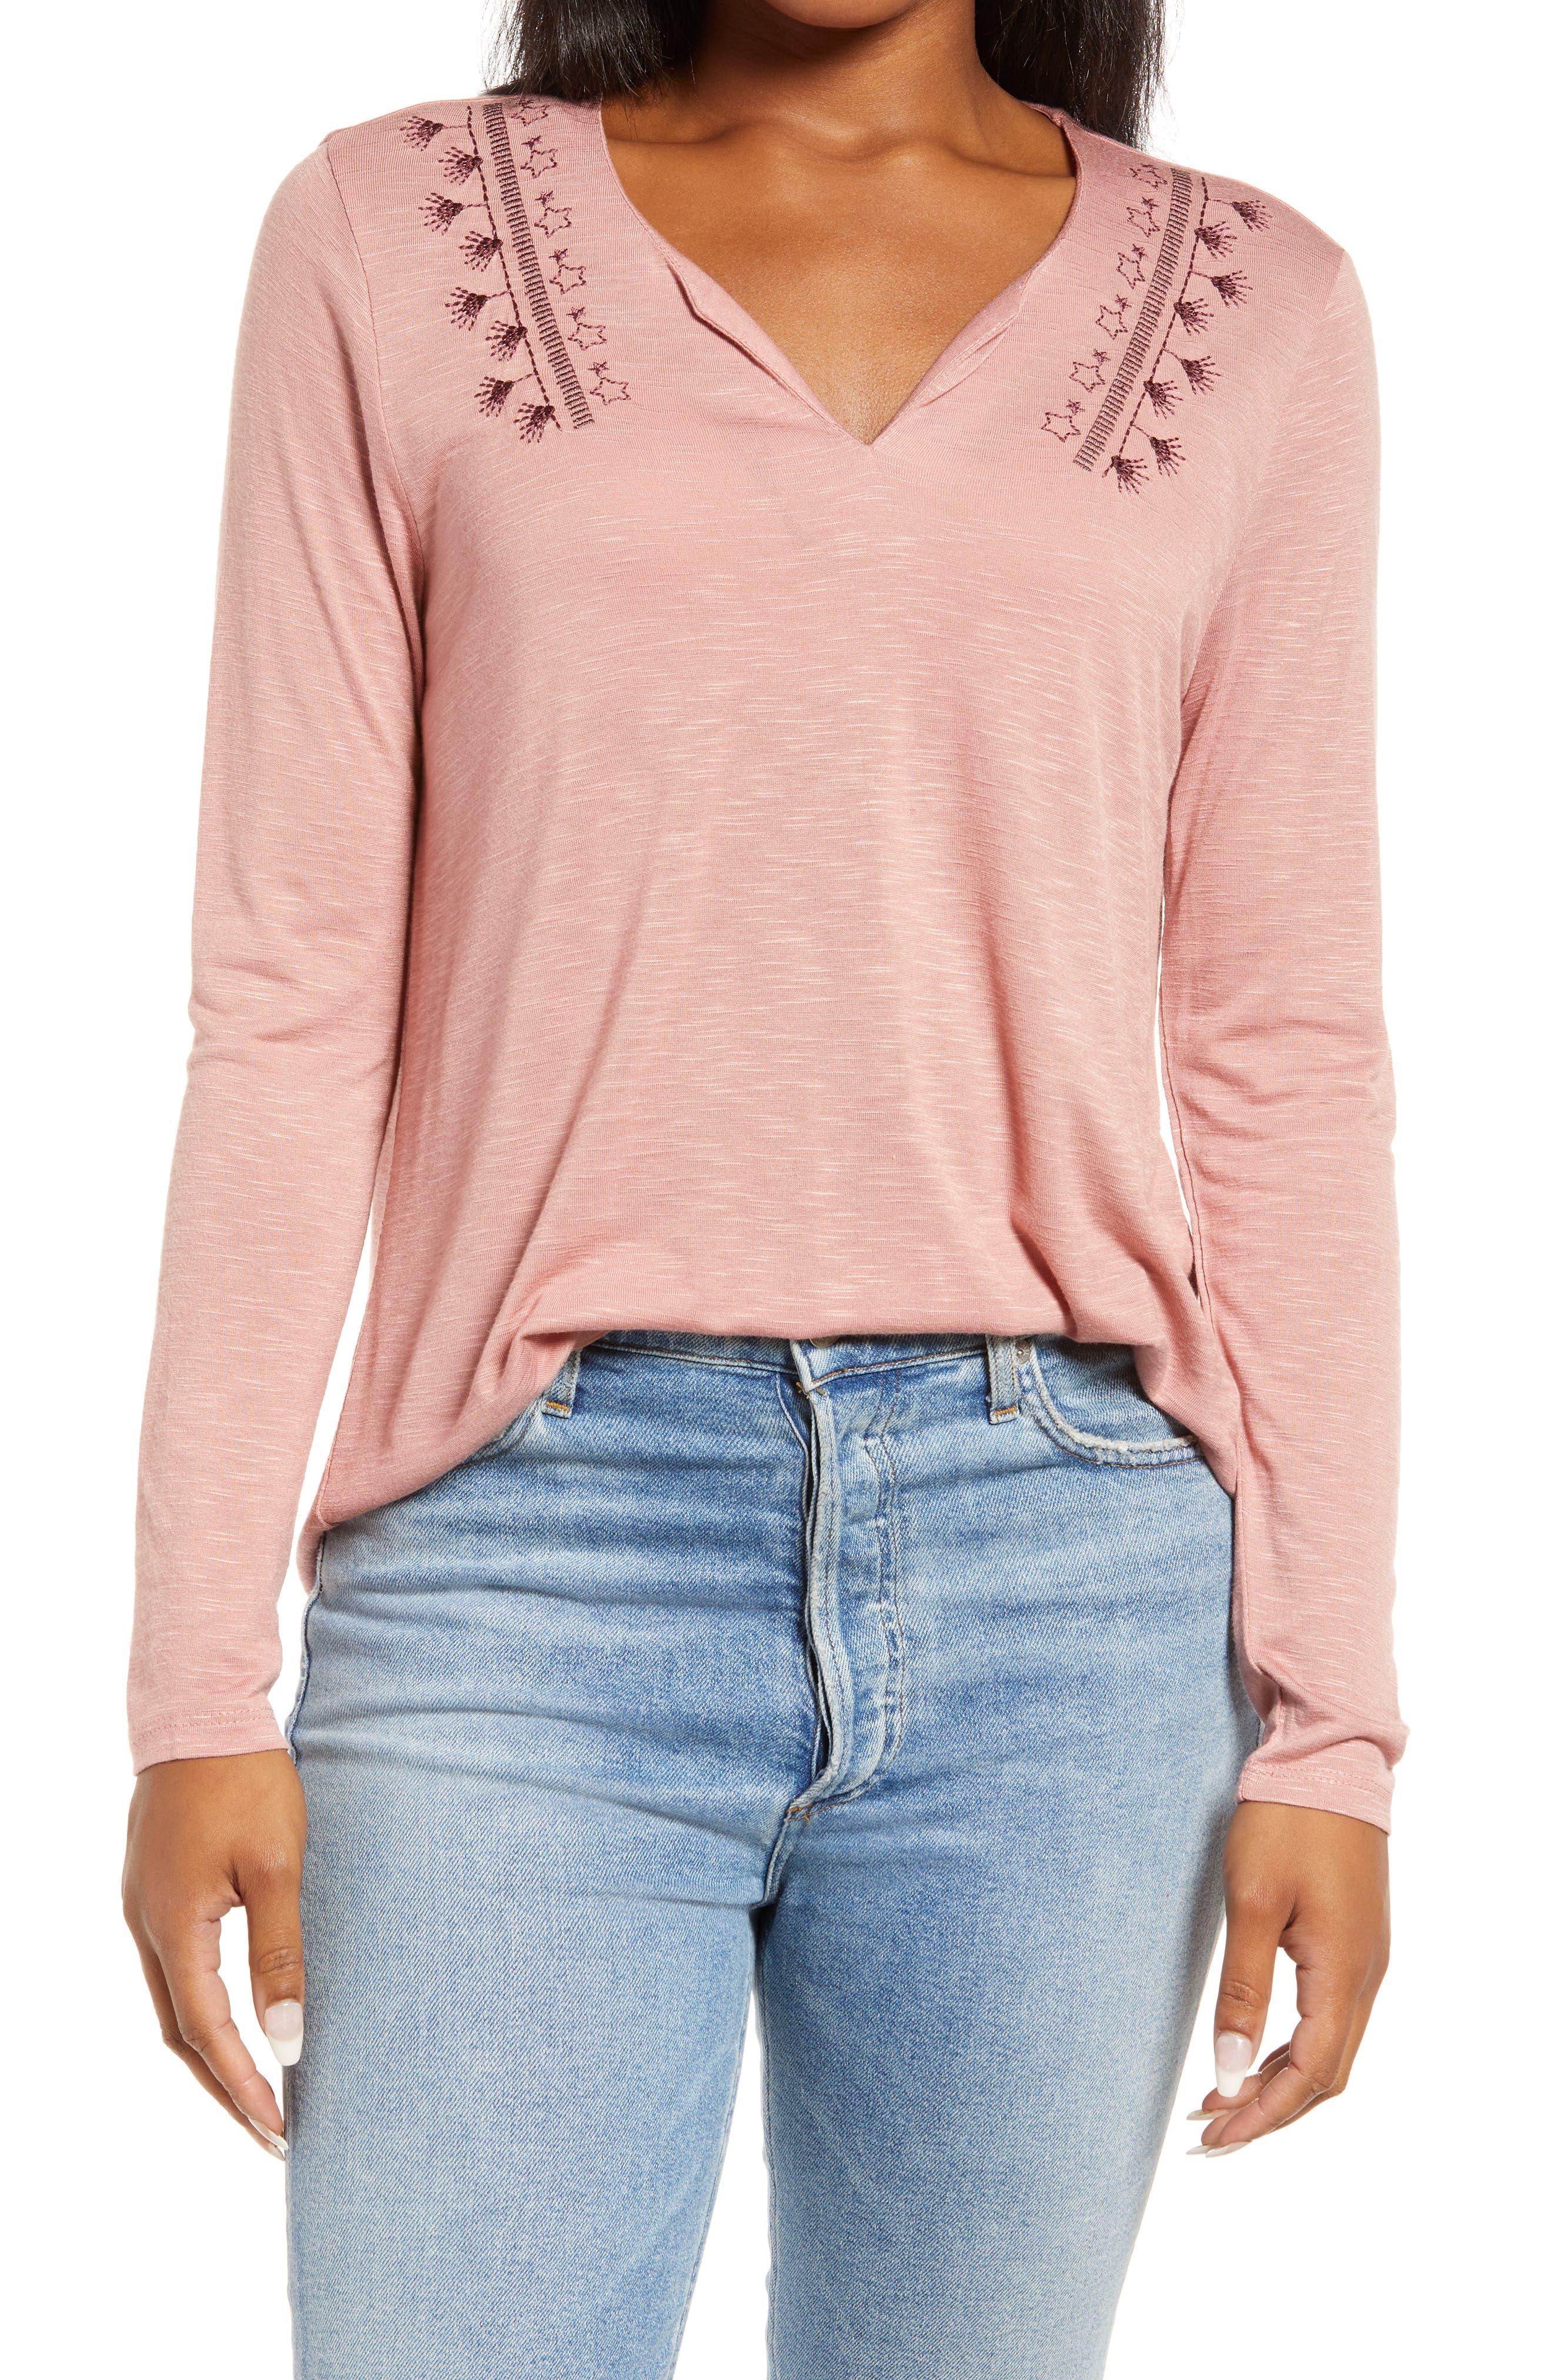 Embroidered Split Neck Long Sleeve T-Shirt